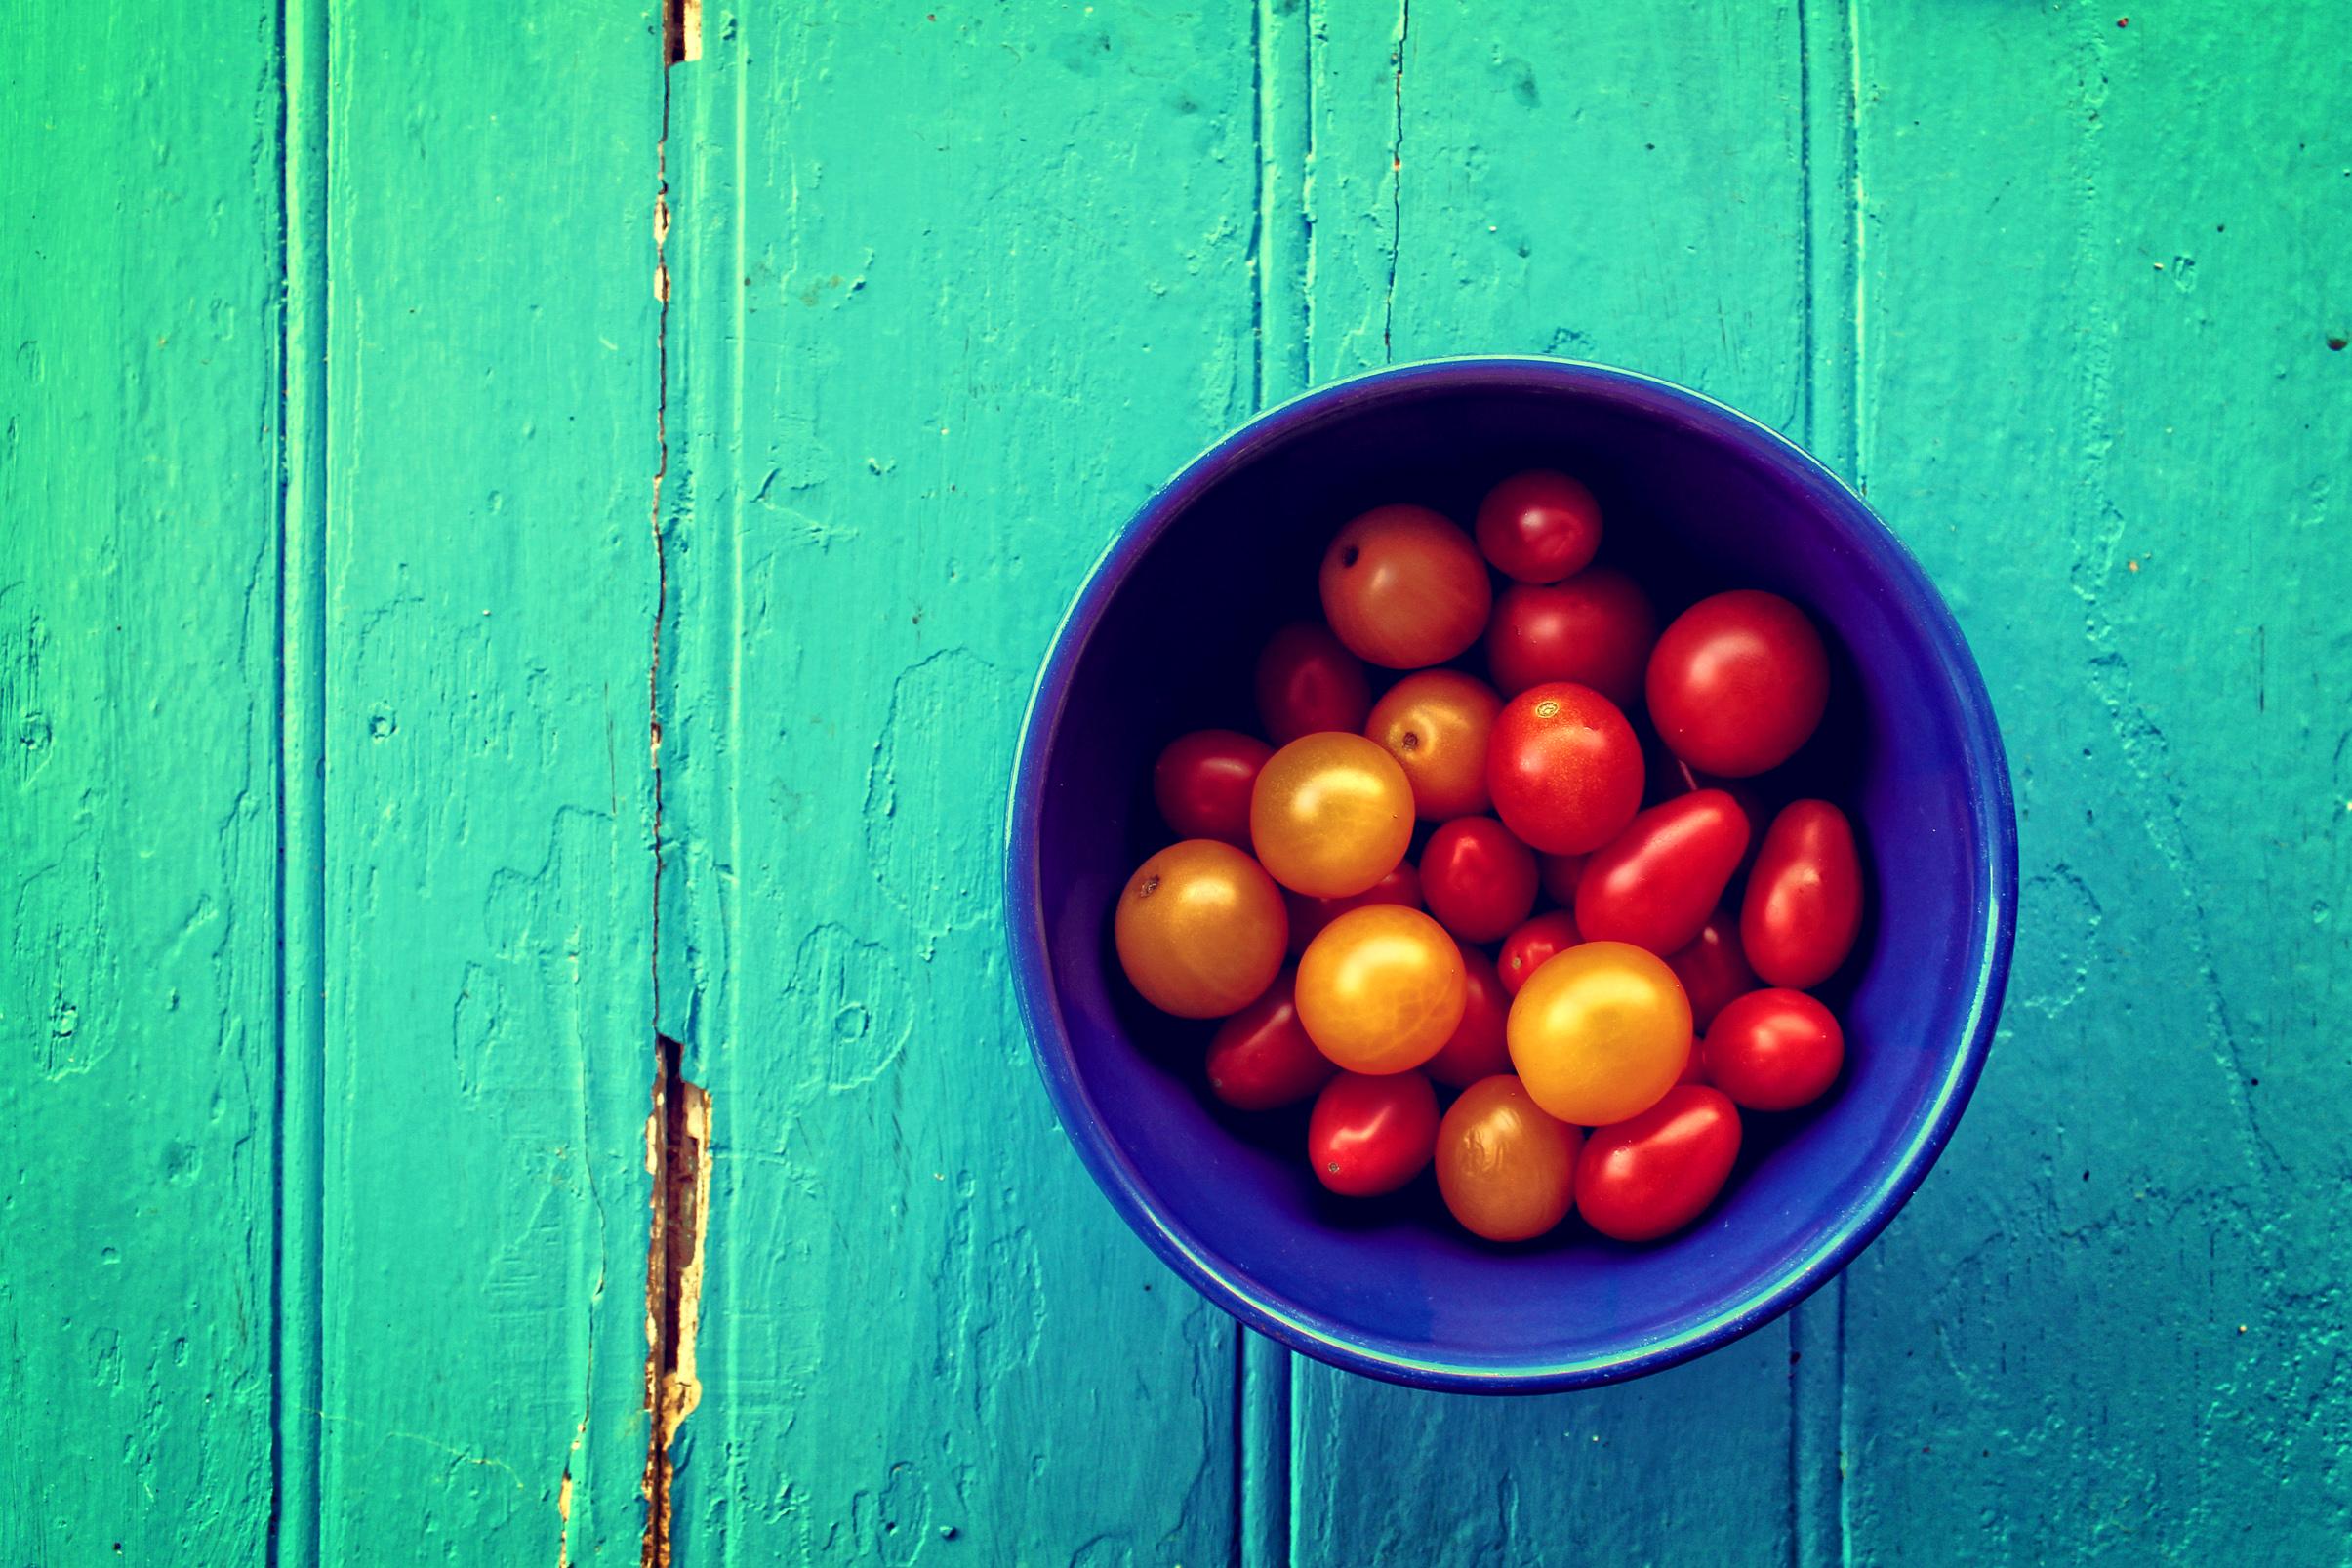 Fresh colorful cherry tomatoes on wood background - organic farming photo